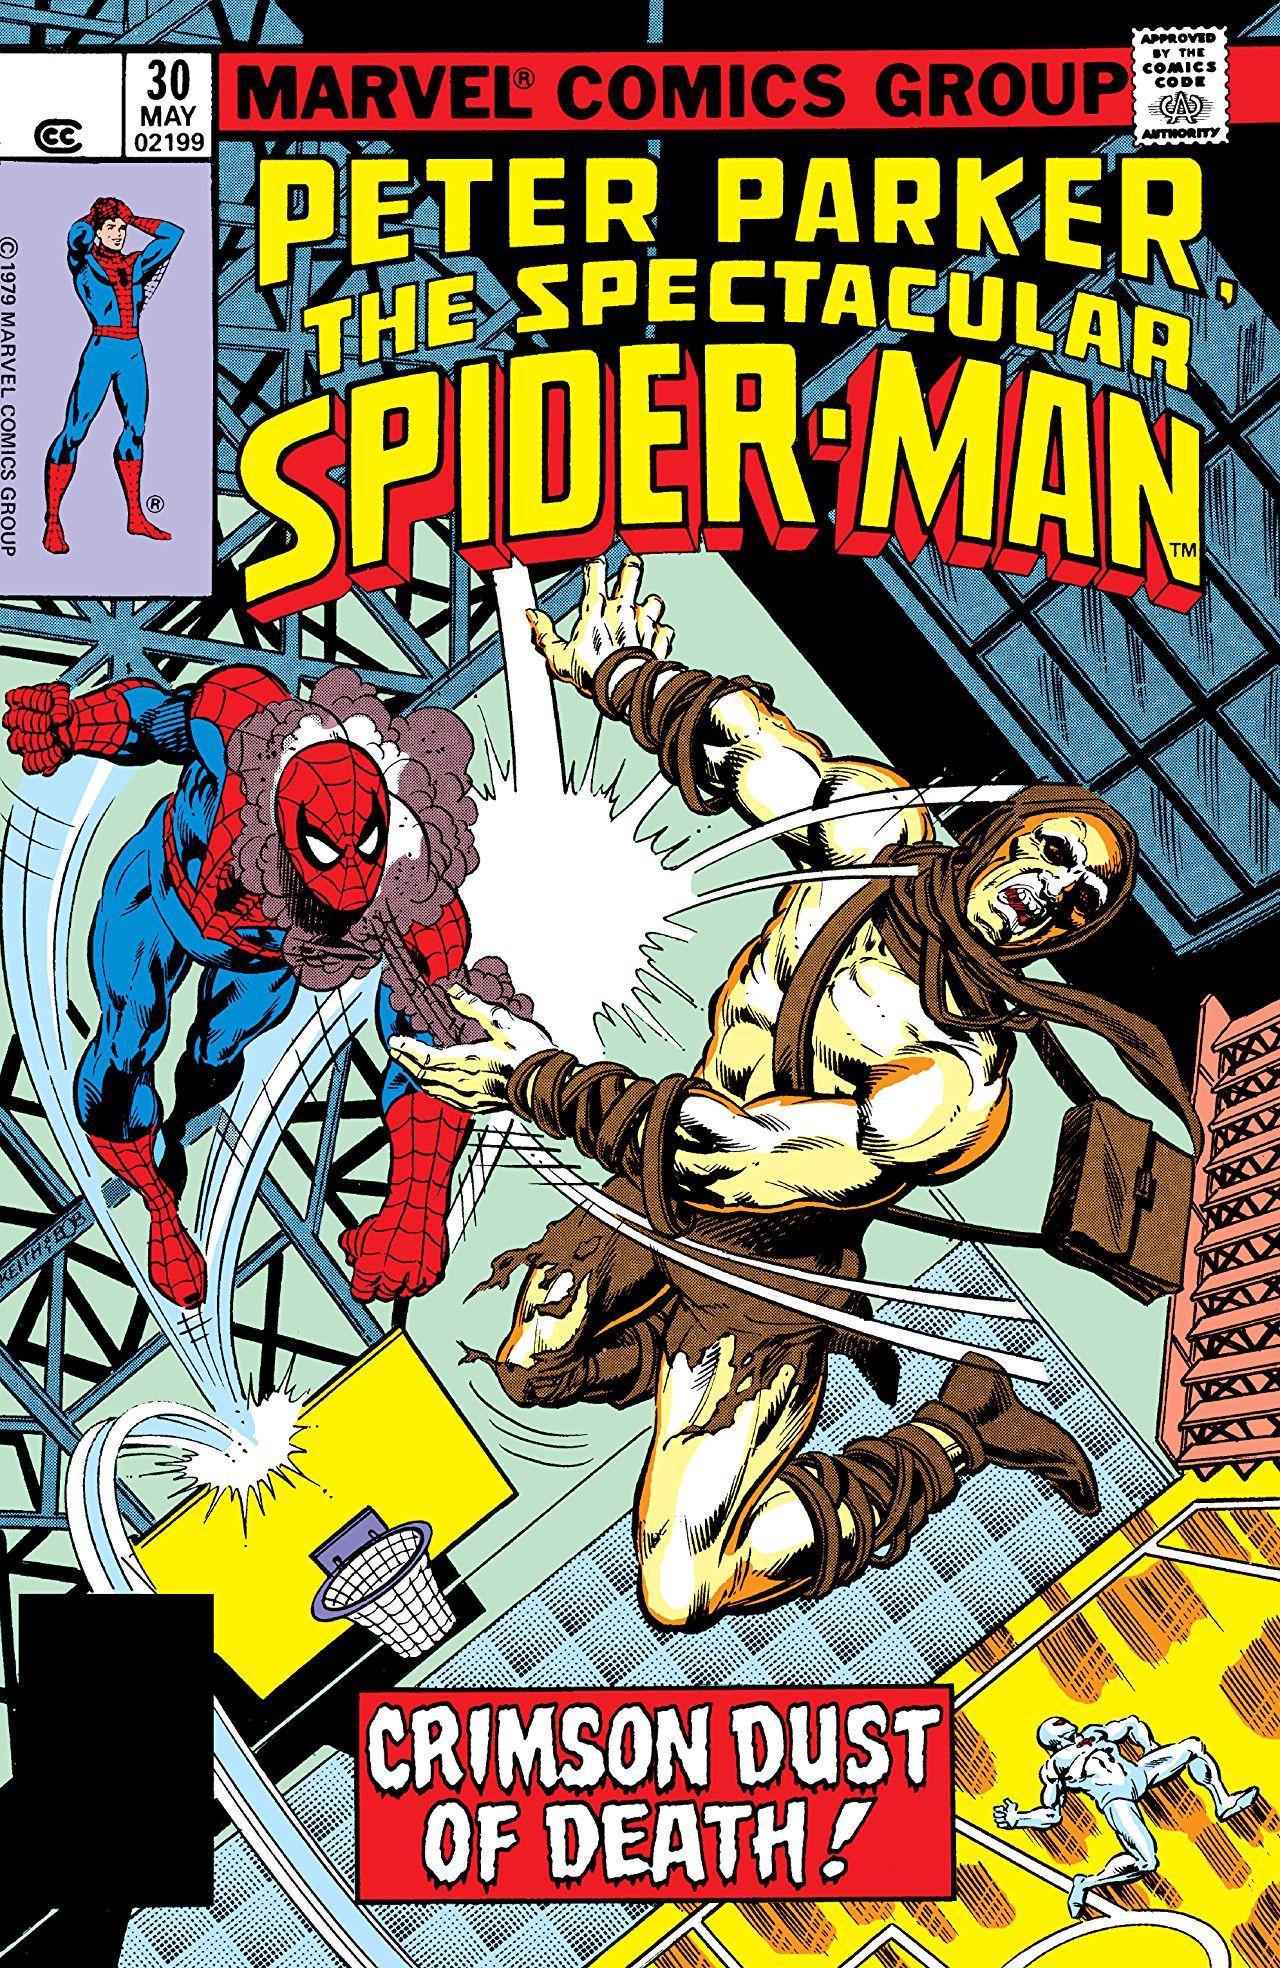 Peter Parker, The Spectacular Spider-Man Vol 1 30